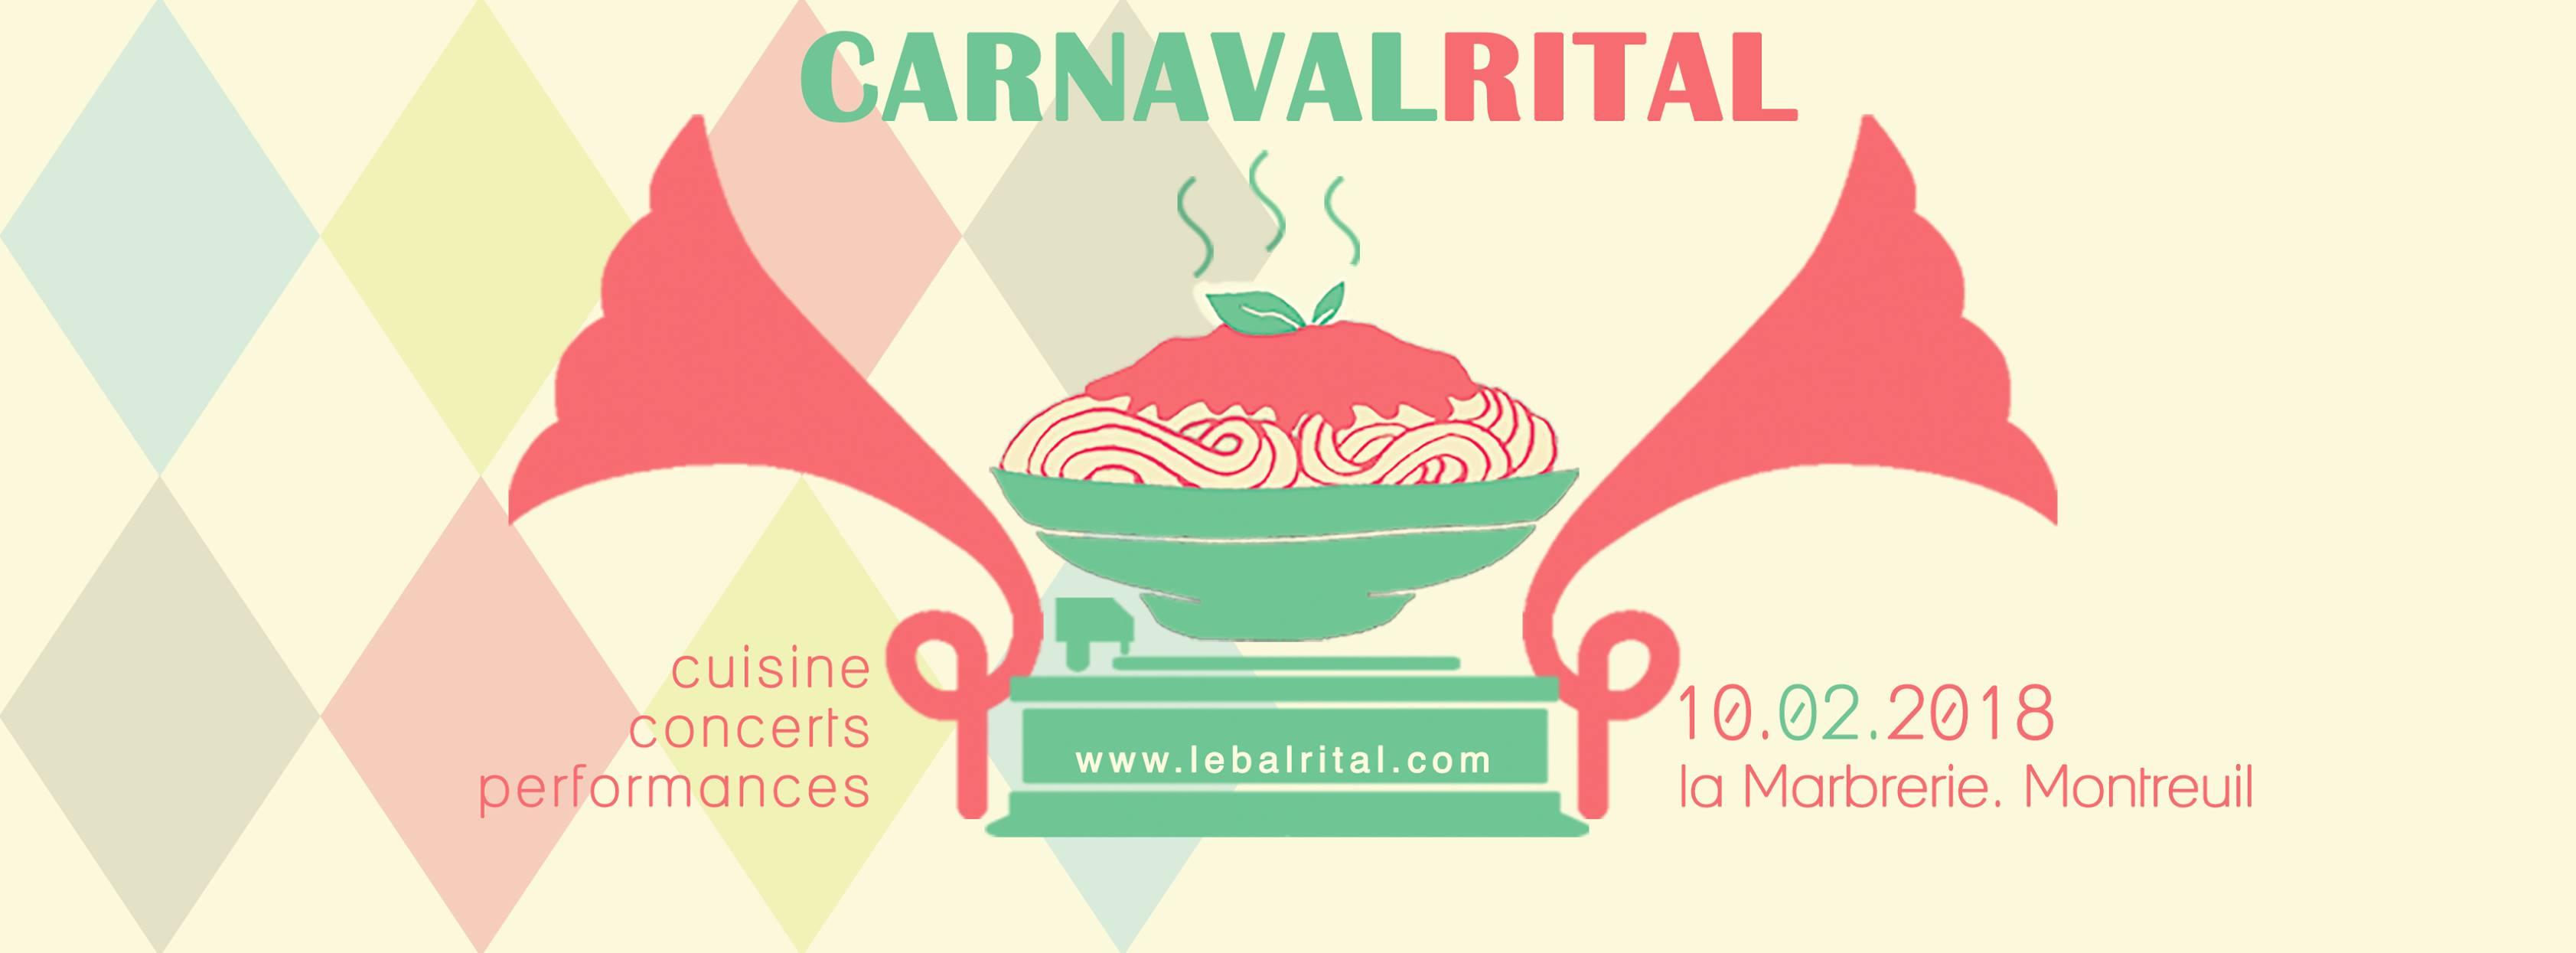 Le Carnaval Rital